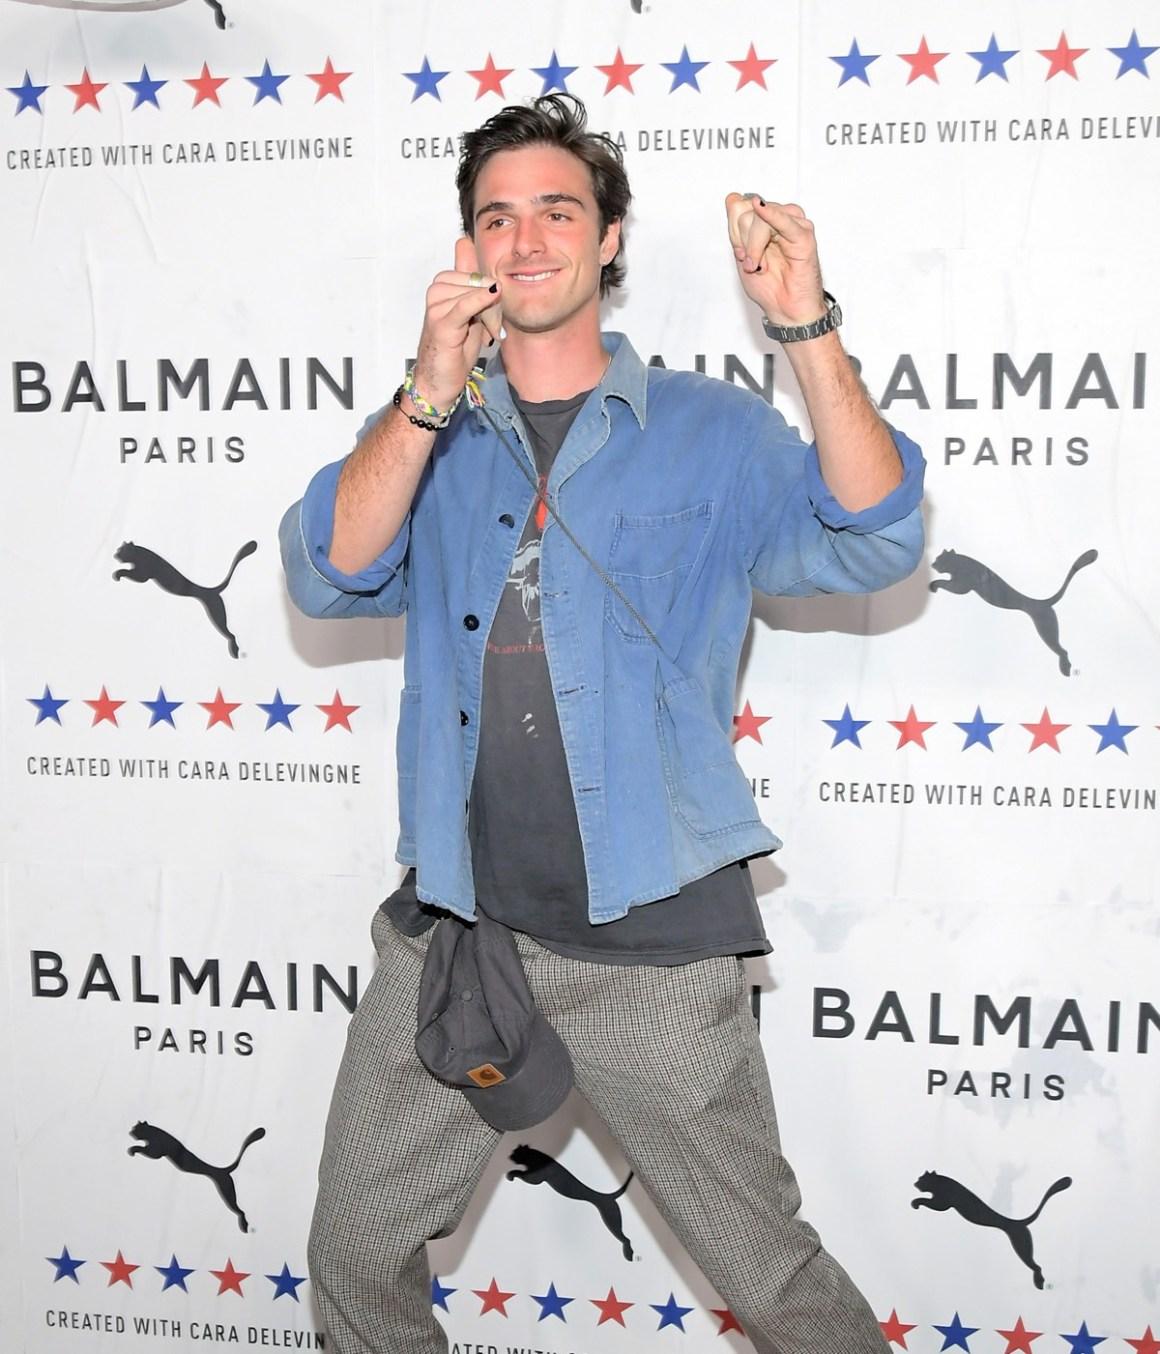 Jacob Elordi 'PUMA x Balmain- created with Cara Delevingne' LA Launch Event